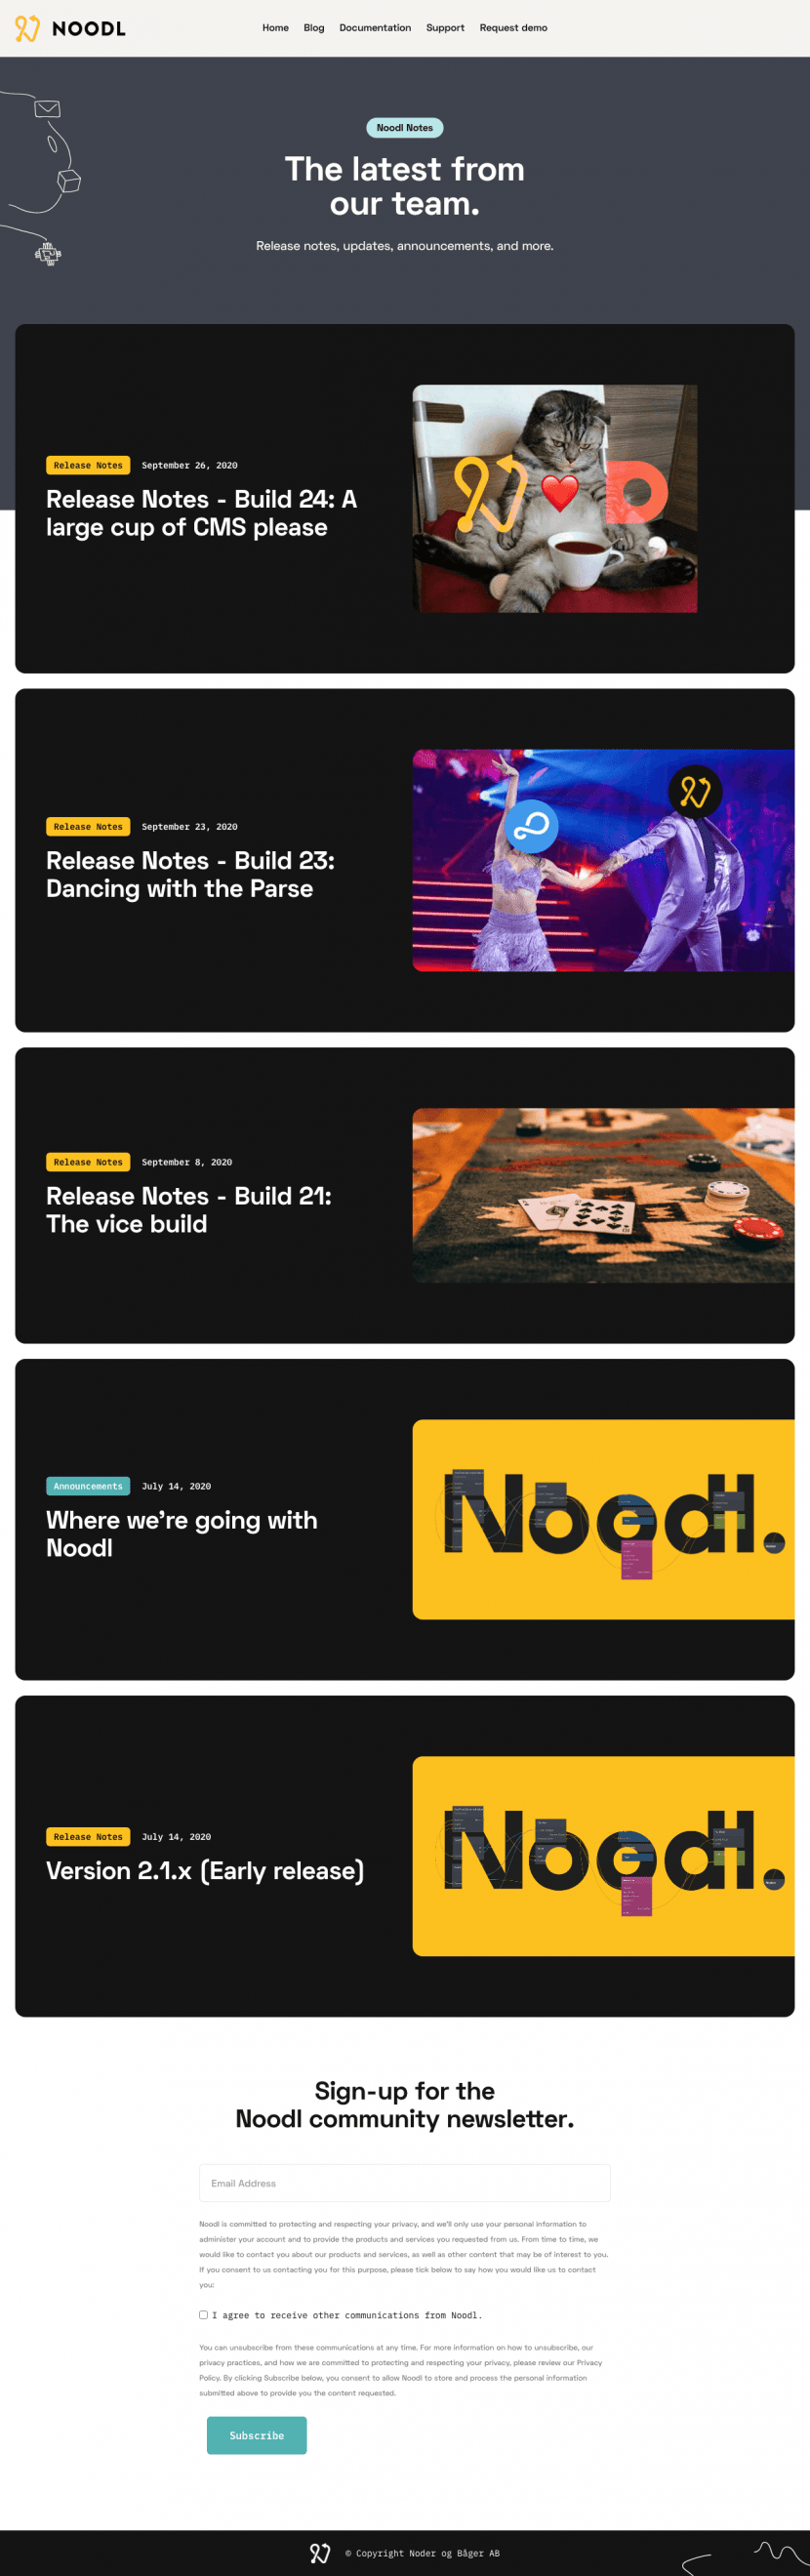 noodl-blog-page